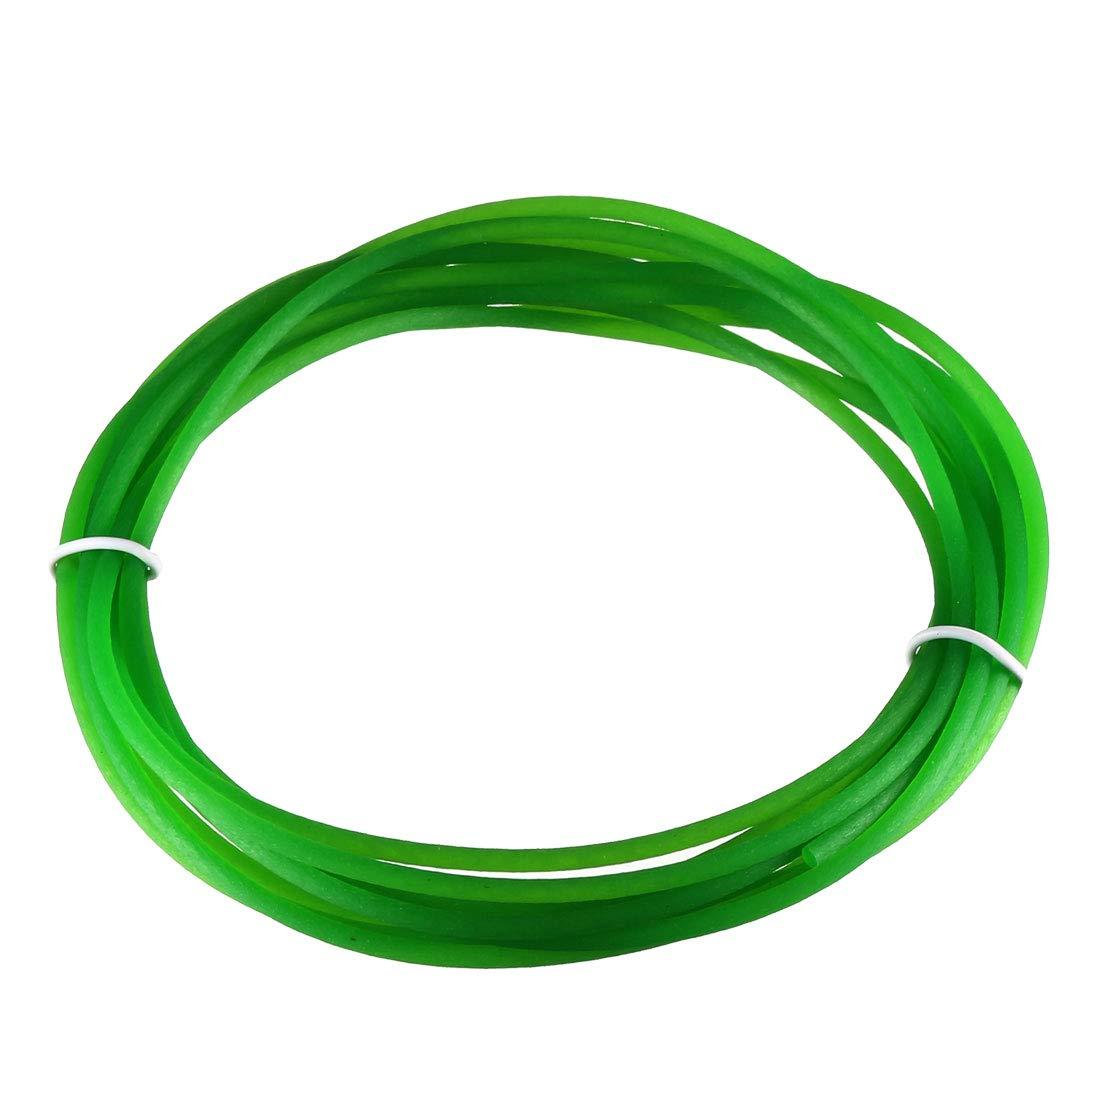 uxcell 10ft 2mm PU Transmission Round Belt High-Performance Urethane Belting Green for Conveyor Bonding Machine Dryer